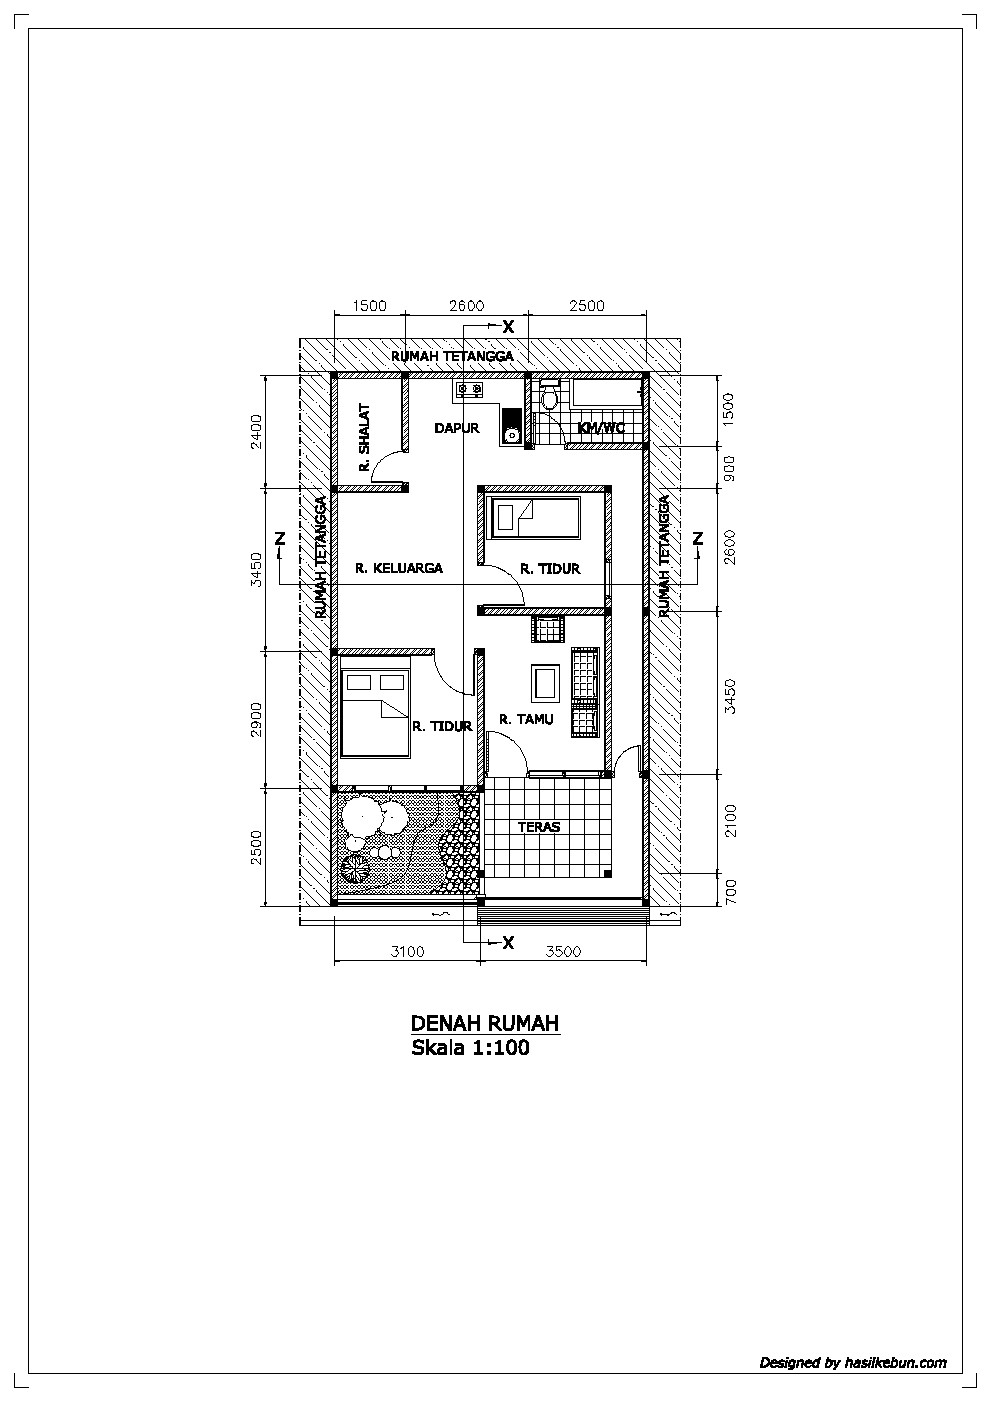 Contoh Gambar Denah Rumah Satu Lantai